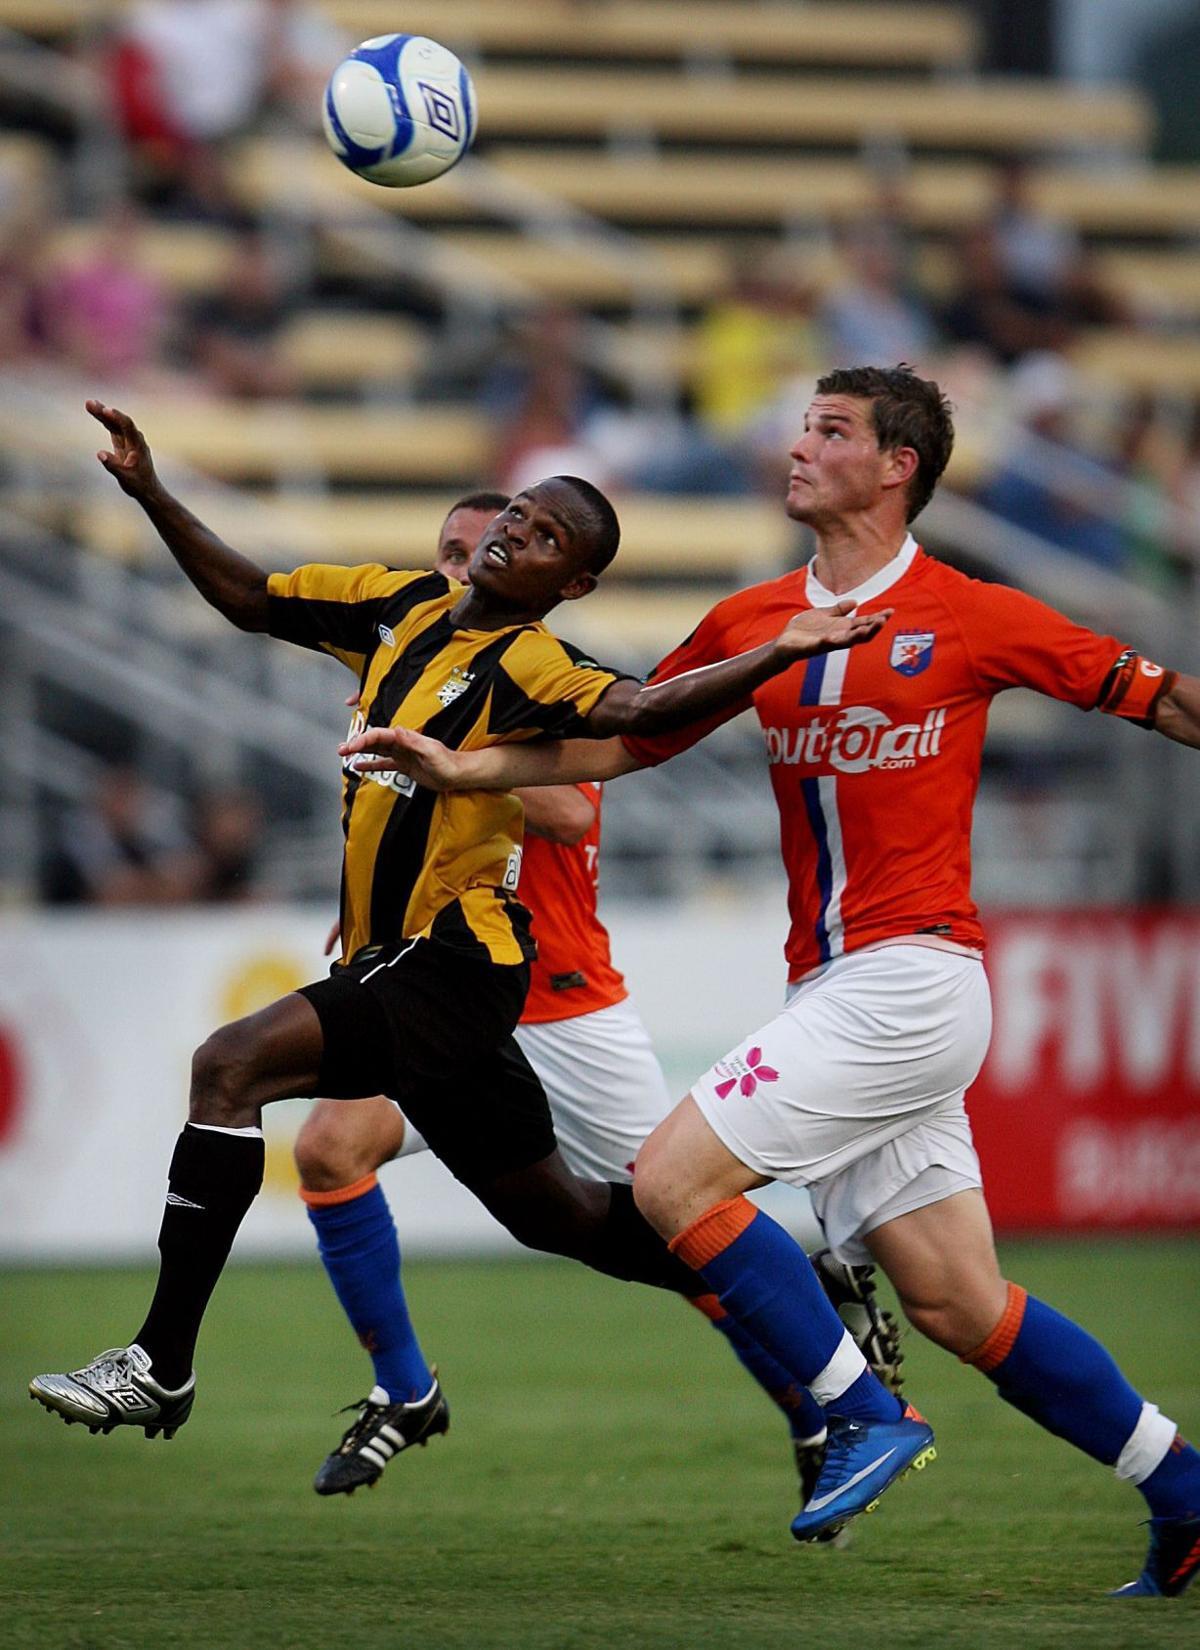 Charleston Battery to face Pittsburgh Riverhounds tonight at Blackbaud Stadium